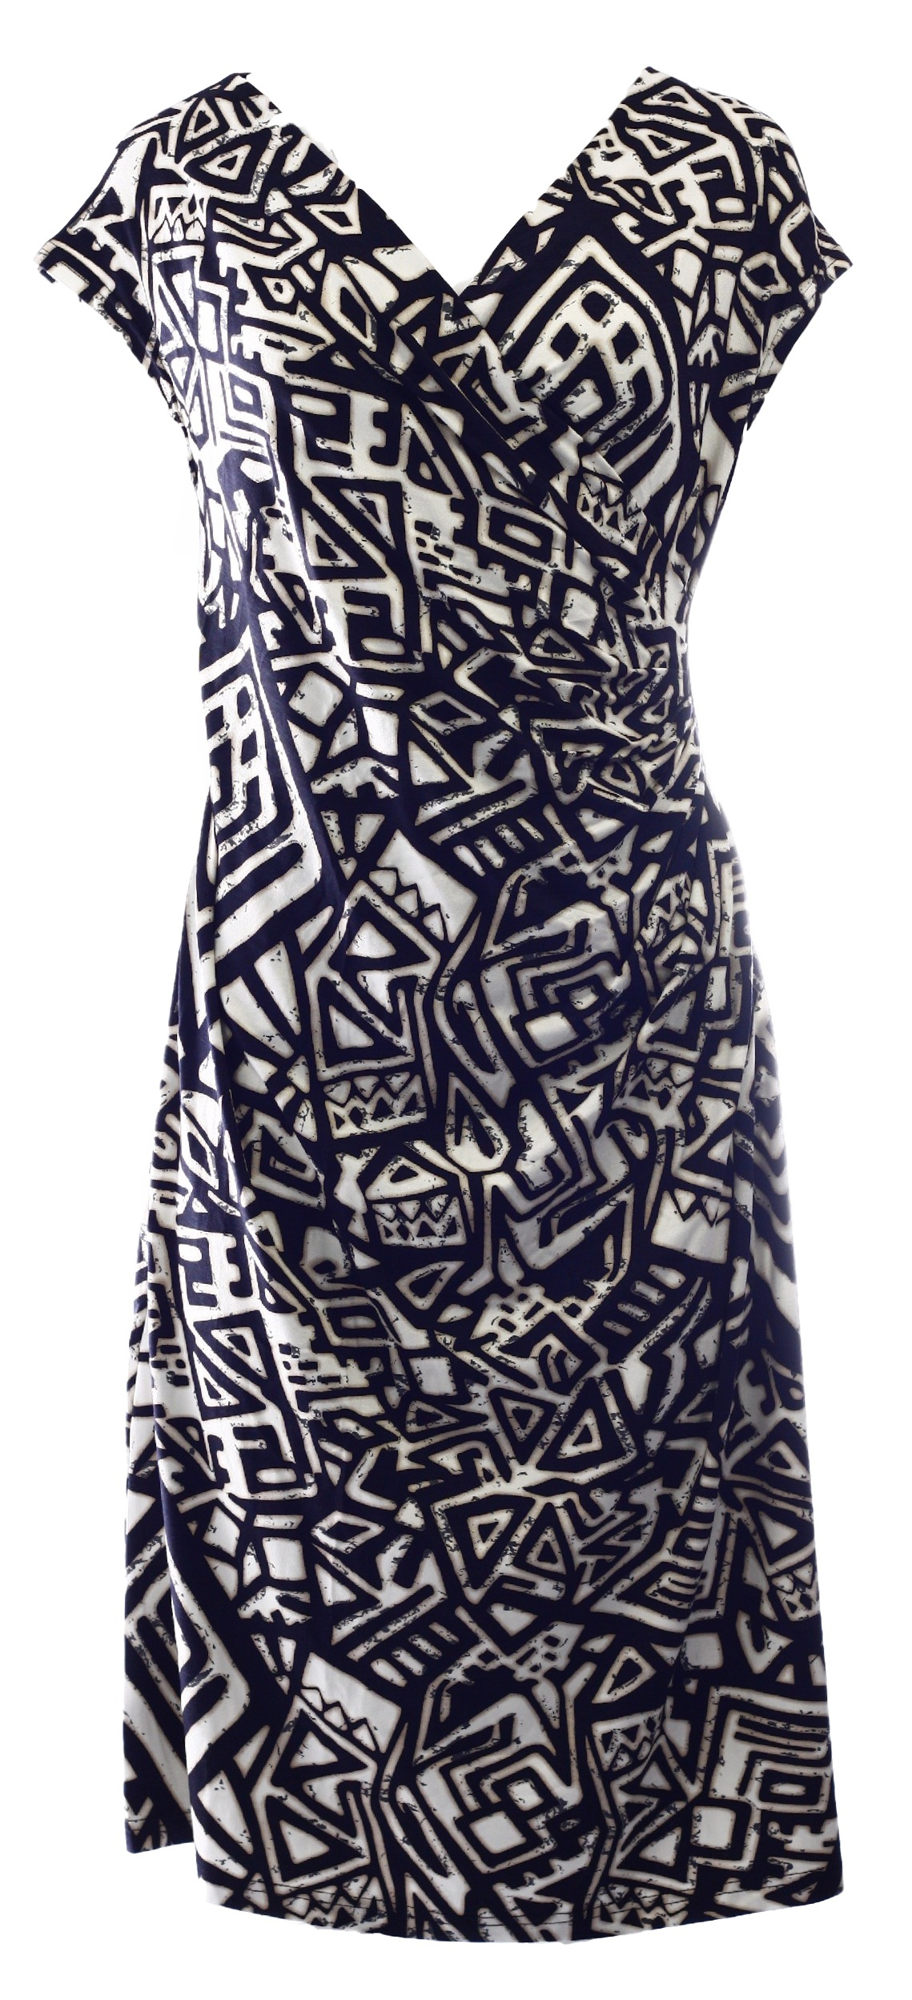 Dámské šaty 6205 - Vamp Barva: originál, Velikost: M